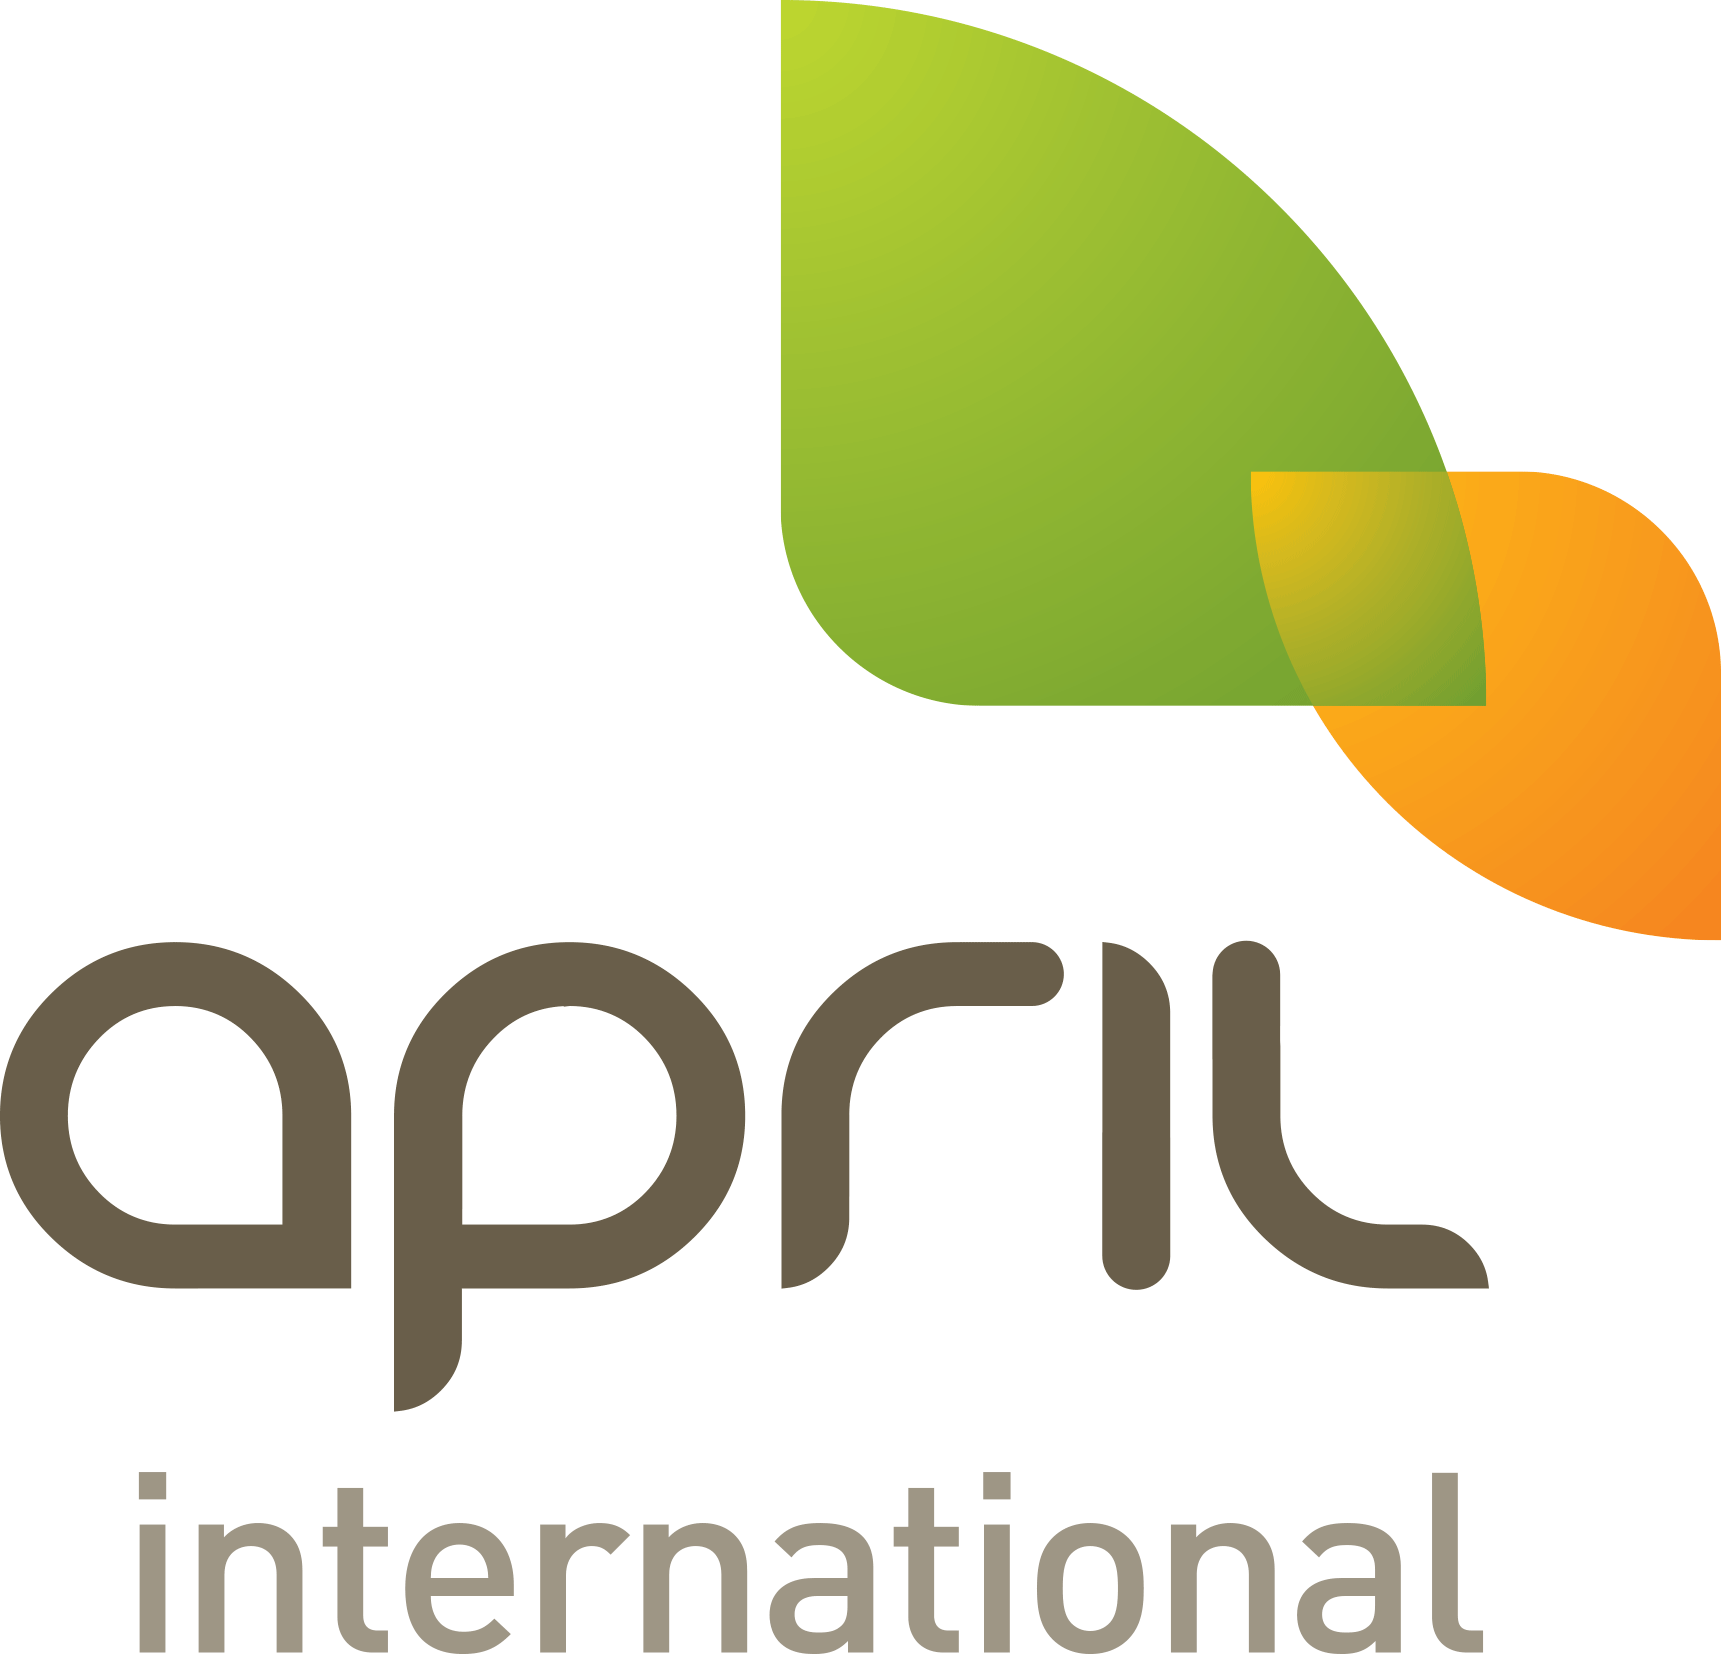 APRIL international expat integration